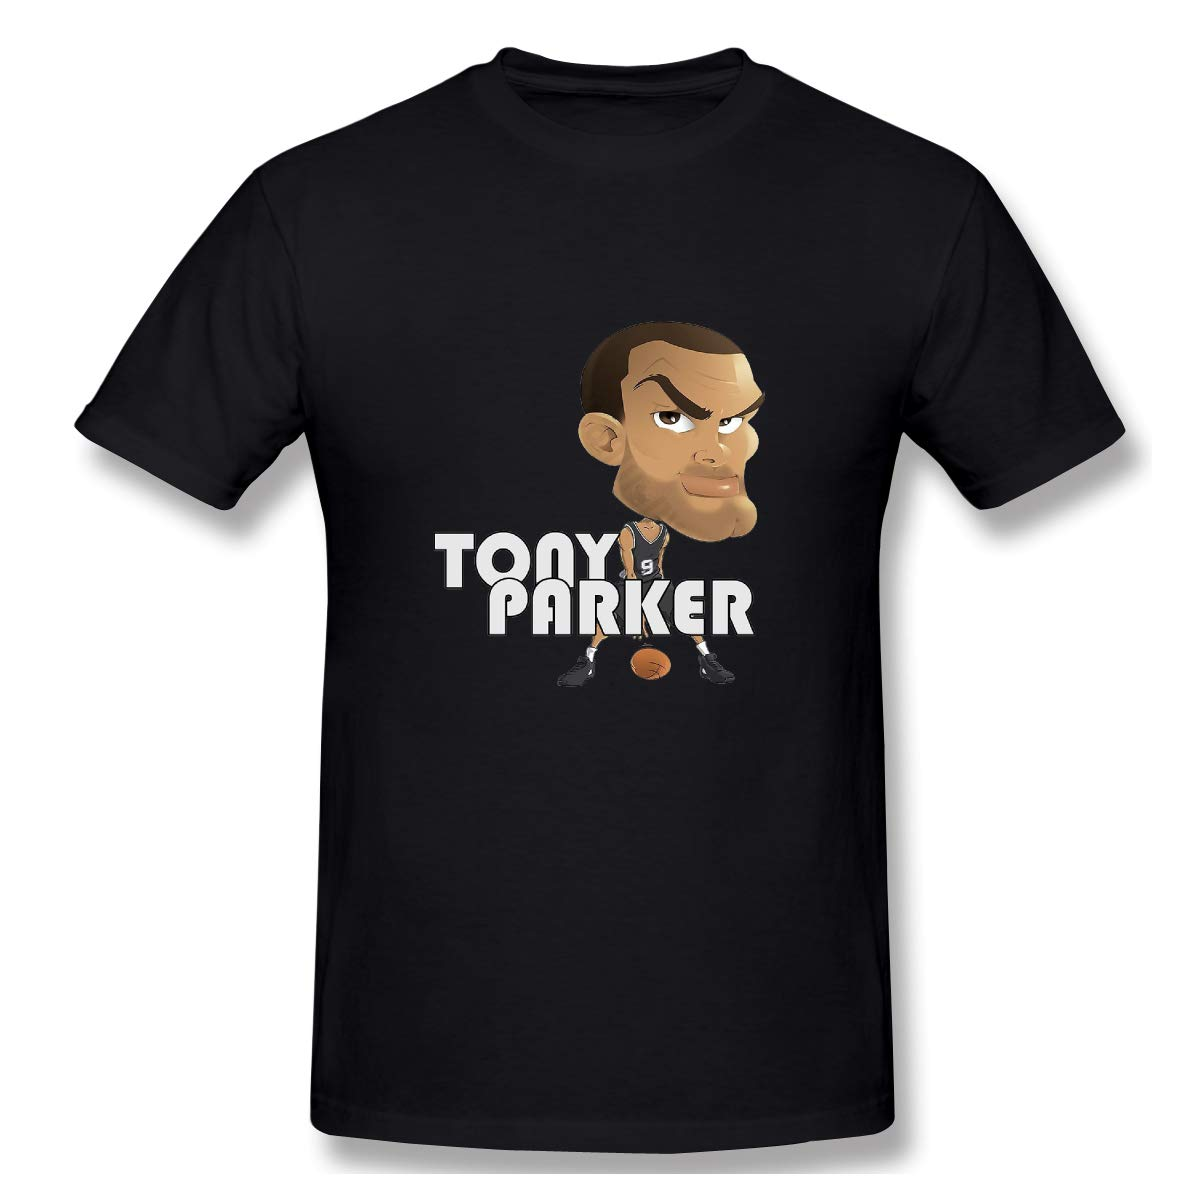 Tommying Sophy S Tony Parker Basketball Cartoon Muscle Tops Tee Short Shirts